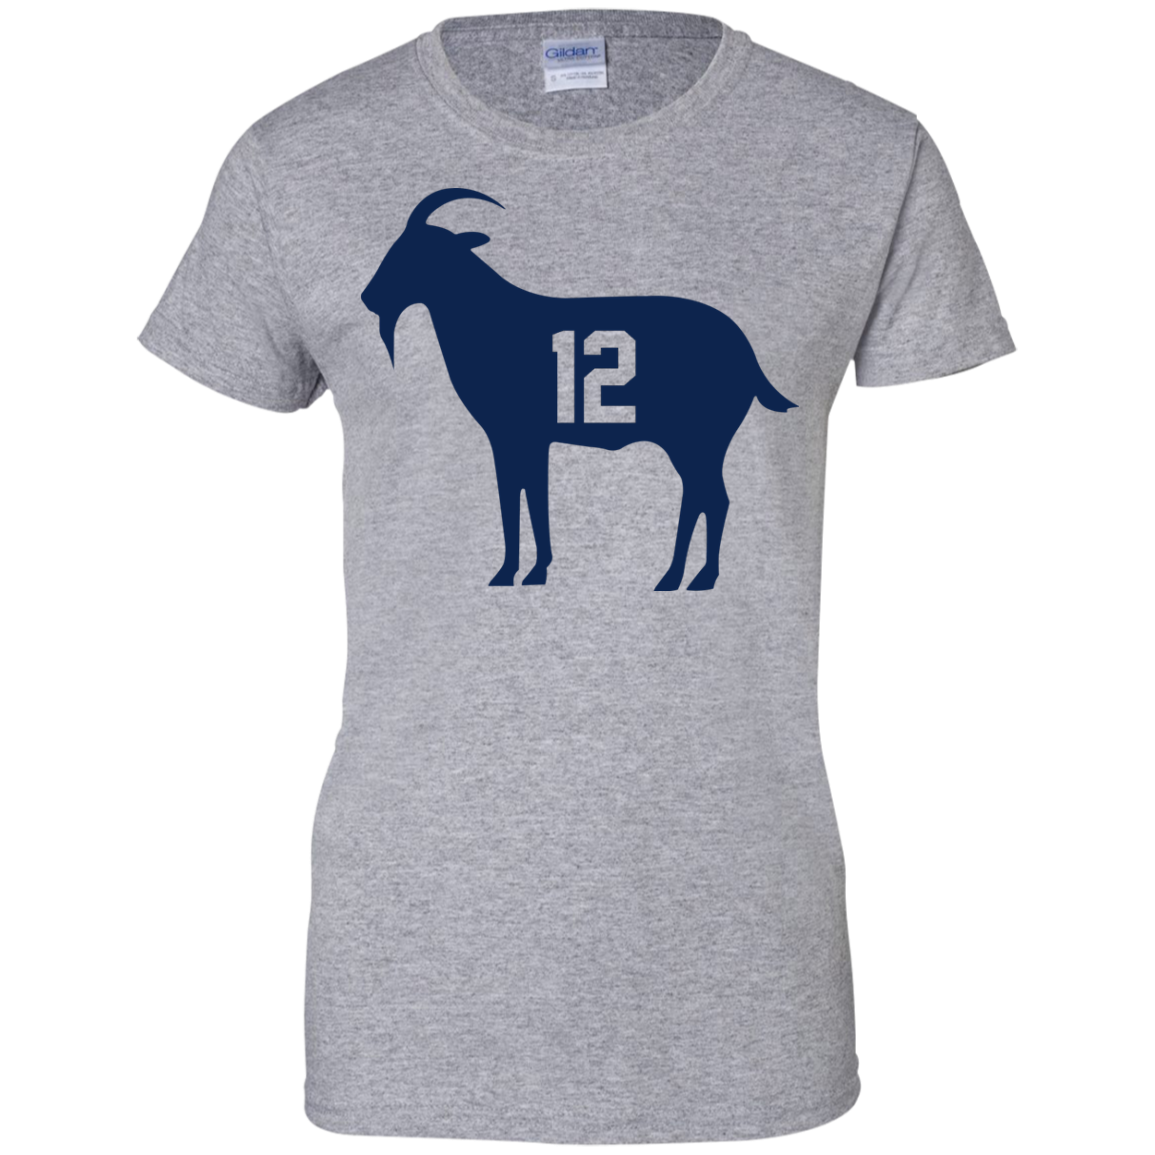 image 82px Goat Tb 12 Tom Brady T Shirt, Hoodies, Tank Top